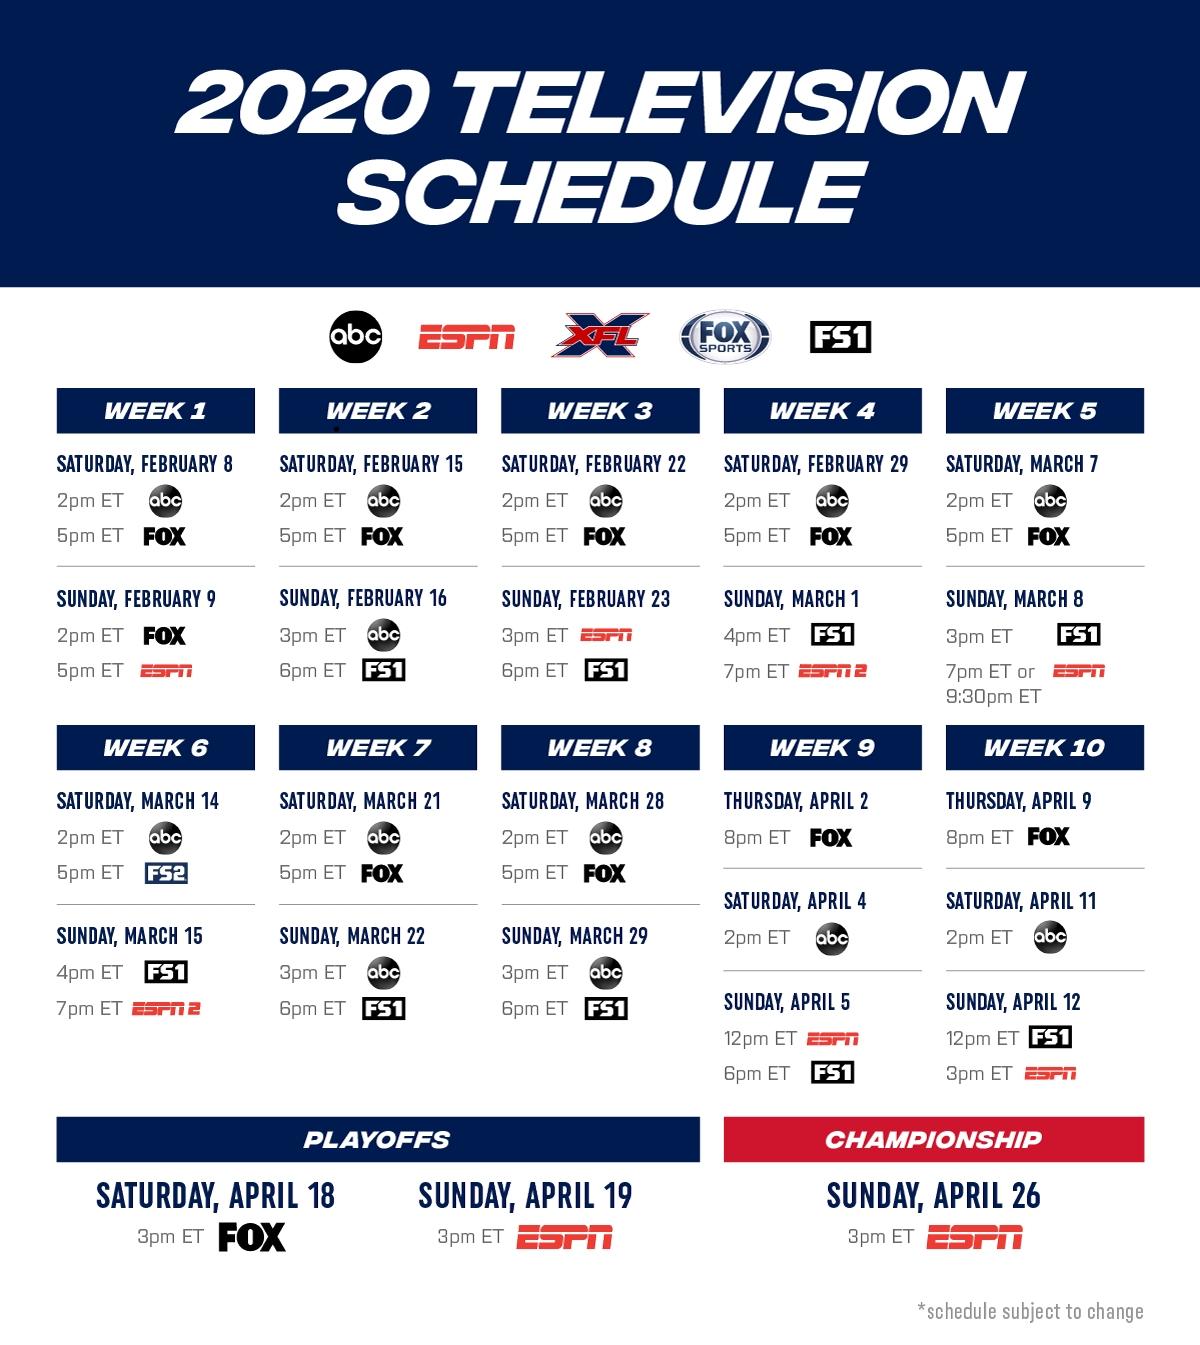 Printable Nfl Schedule For 2019 2020 - Calendar